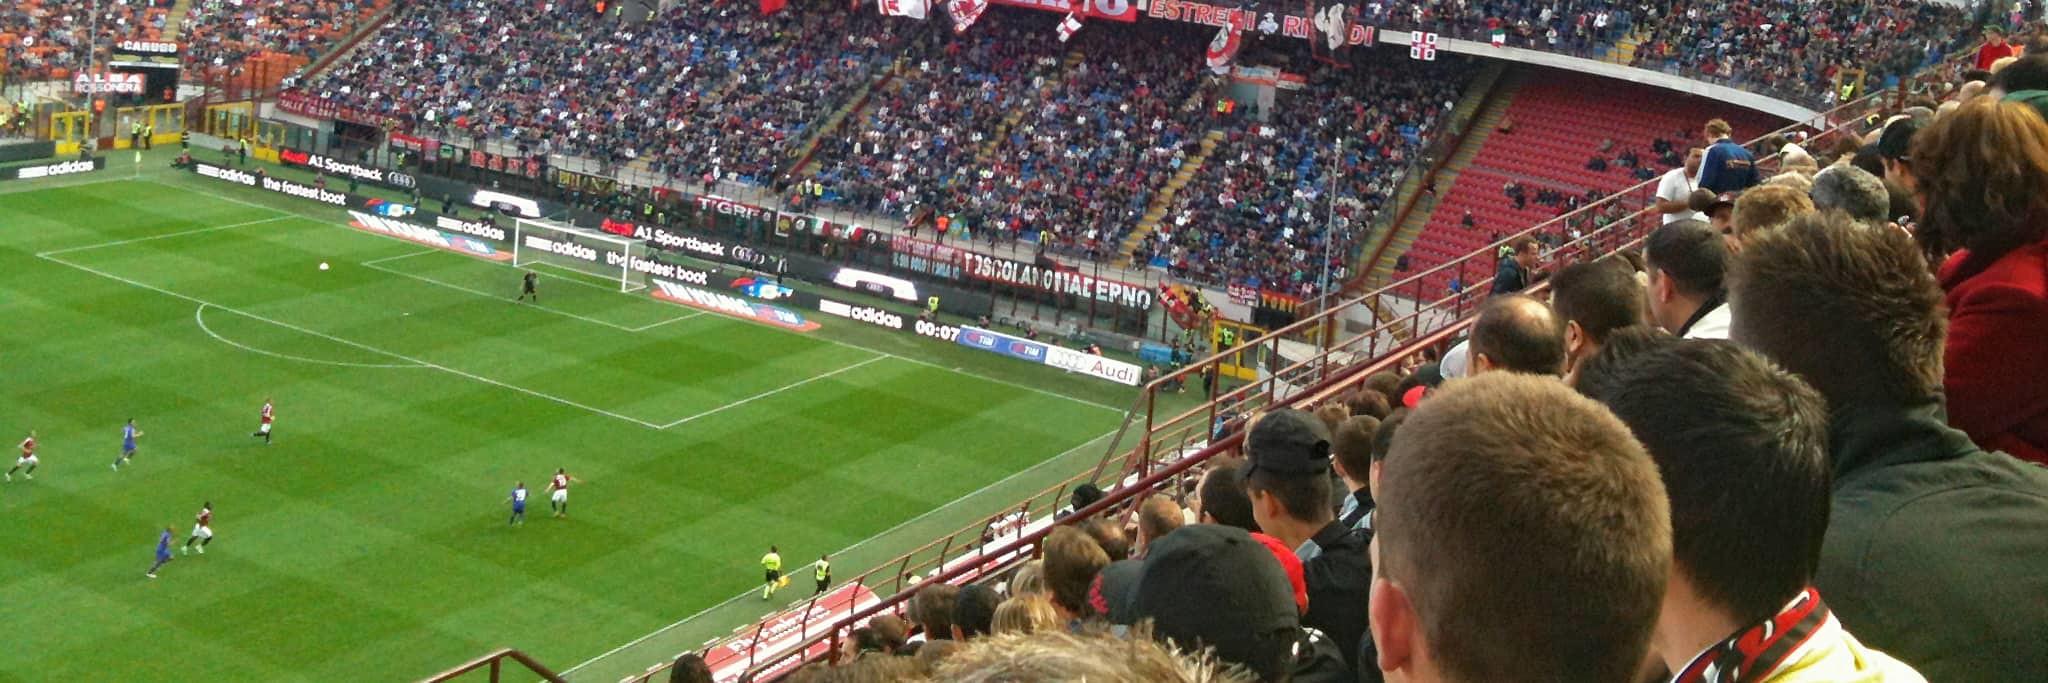 Inter Milan - Lazio • Feb-14 2021